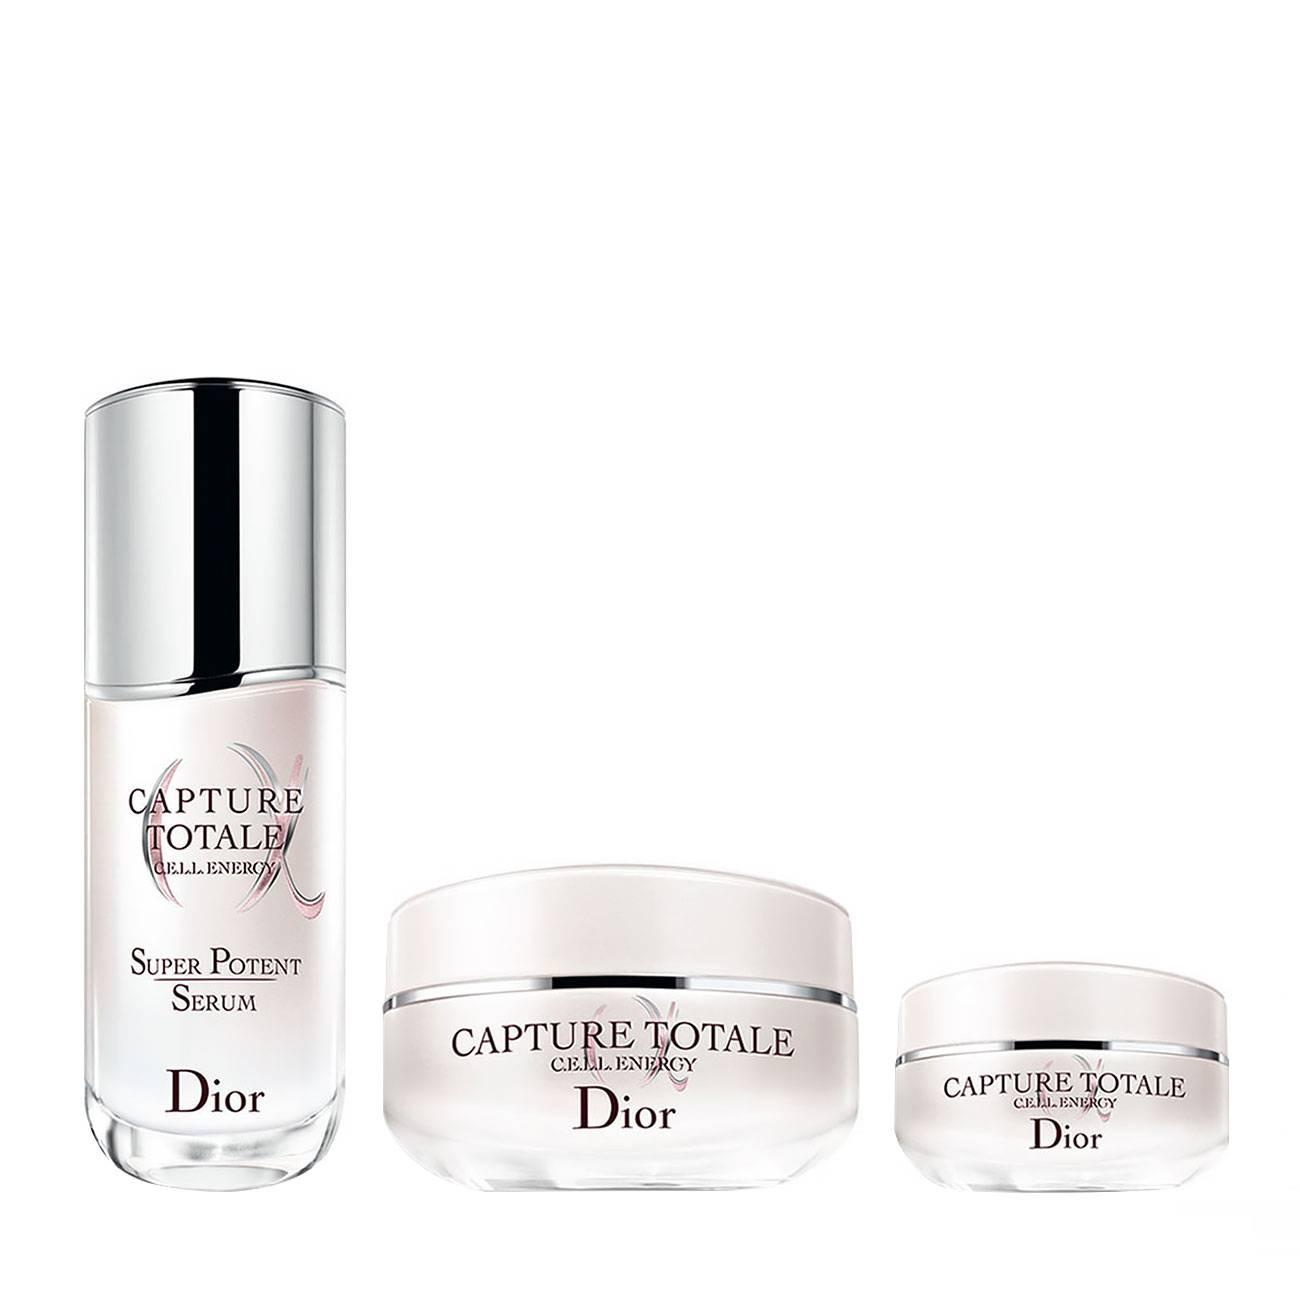 Capture Totale Beauty Ritual Set 115ml Dior imagine 2021 bestvalue.eu